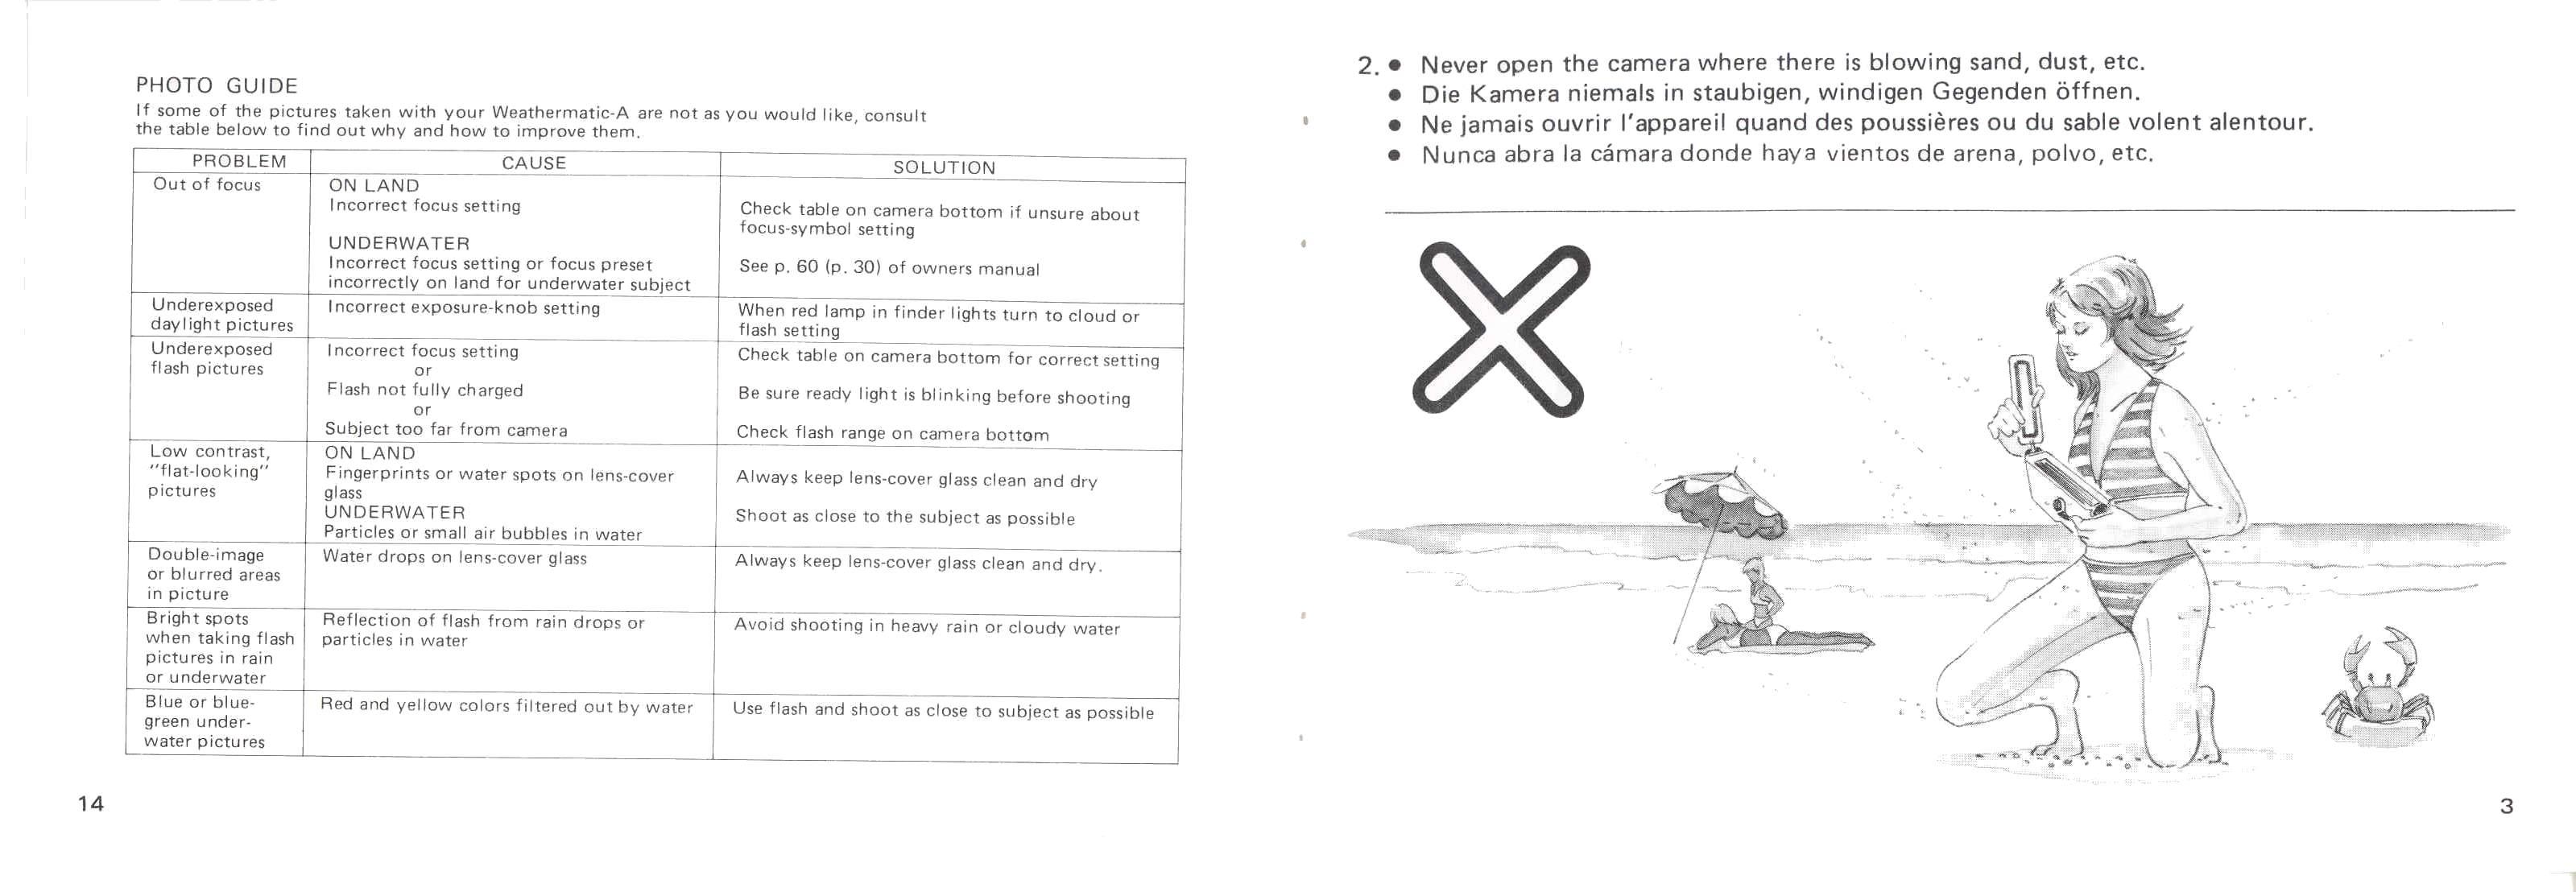 Minolta 110 Weathermatic A (English) Manual